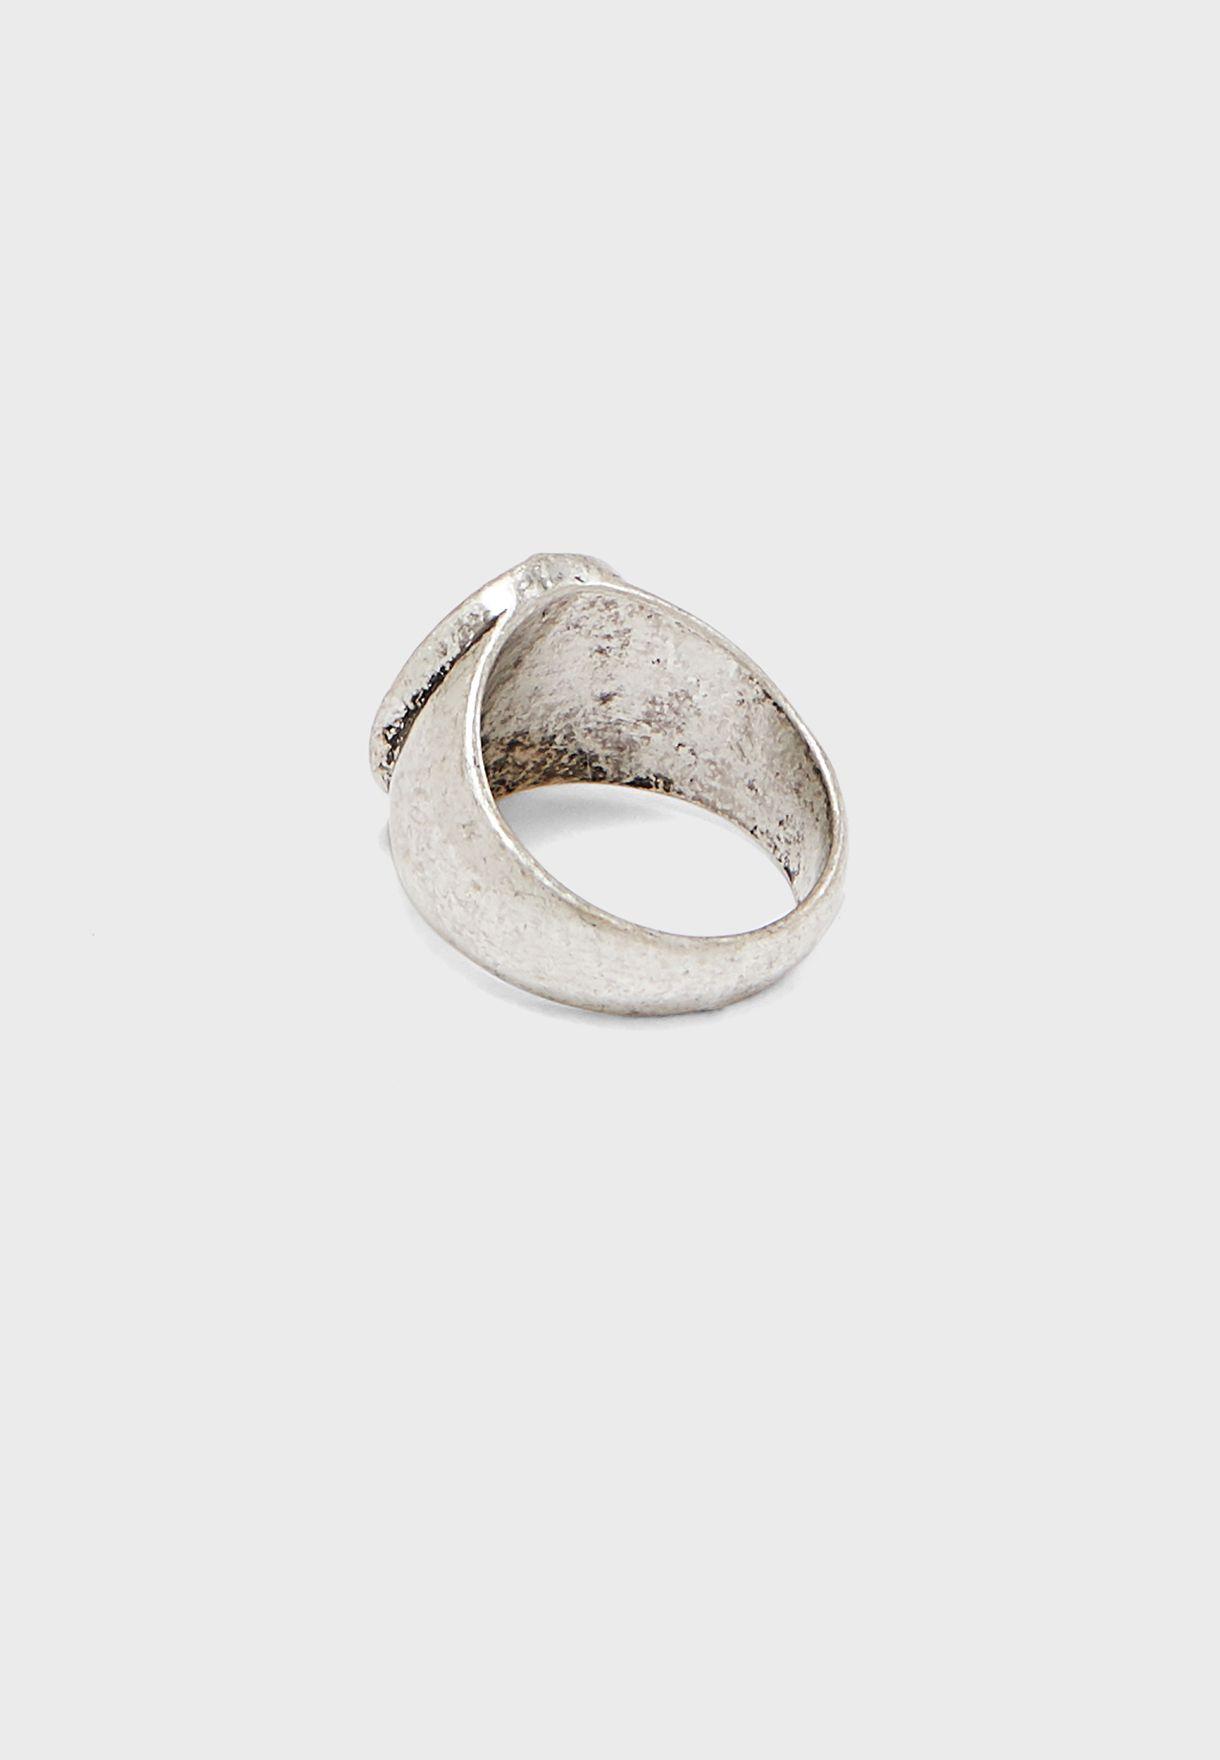 خاتم دائري عريض